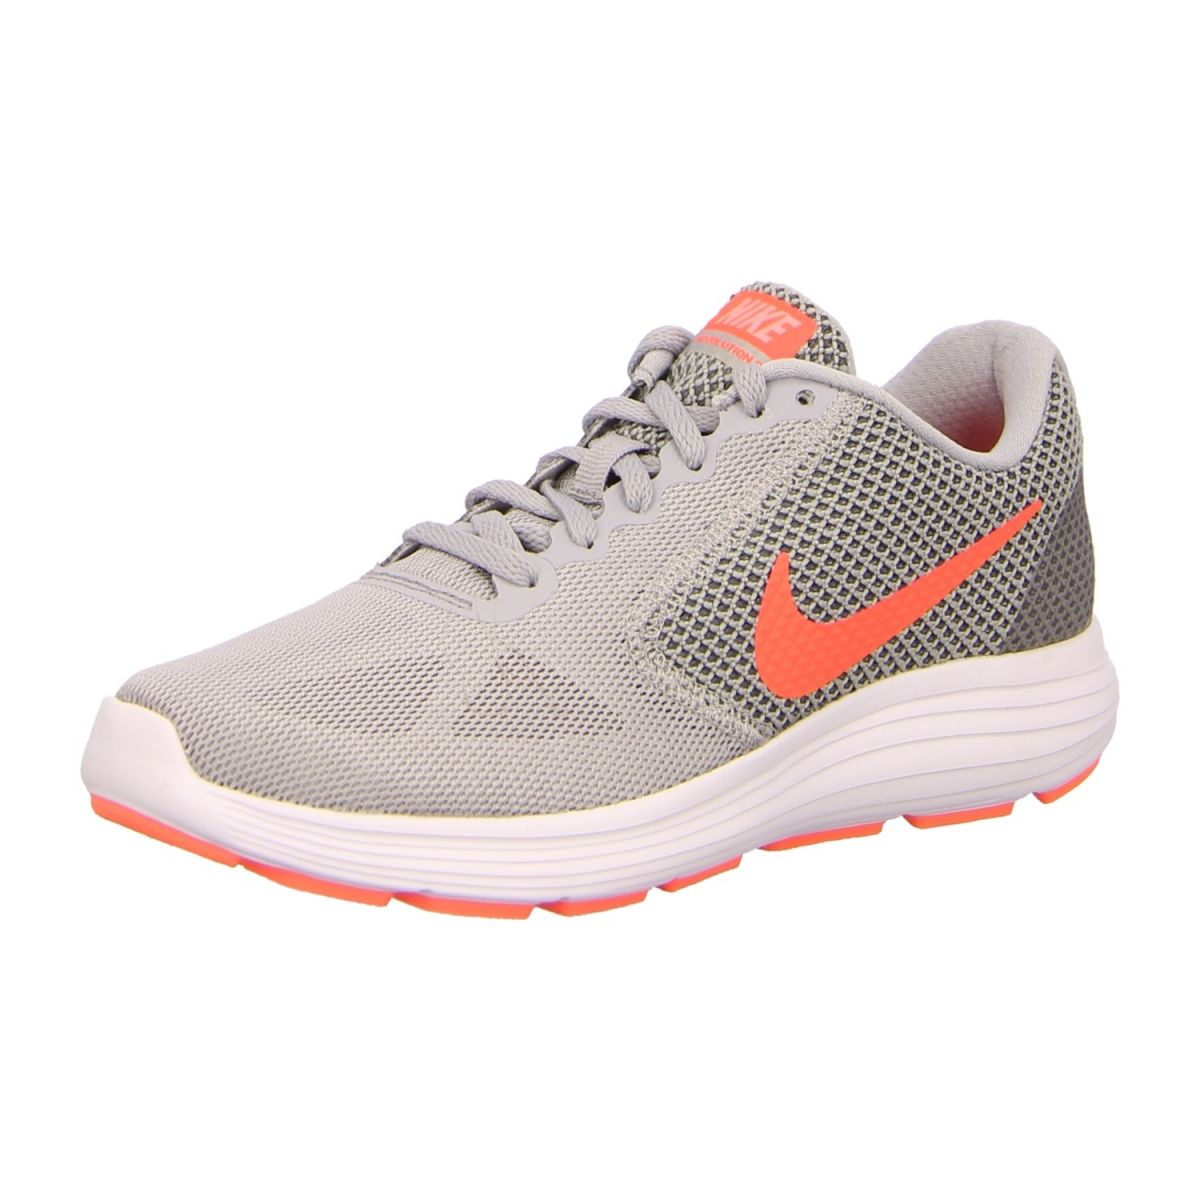 NEU: Nike Sneaker WMNSRevolution3 - 819303 002 - wlf grey/hypr orng-cl